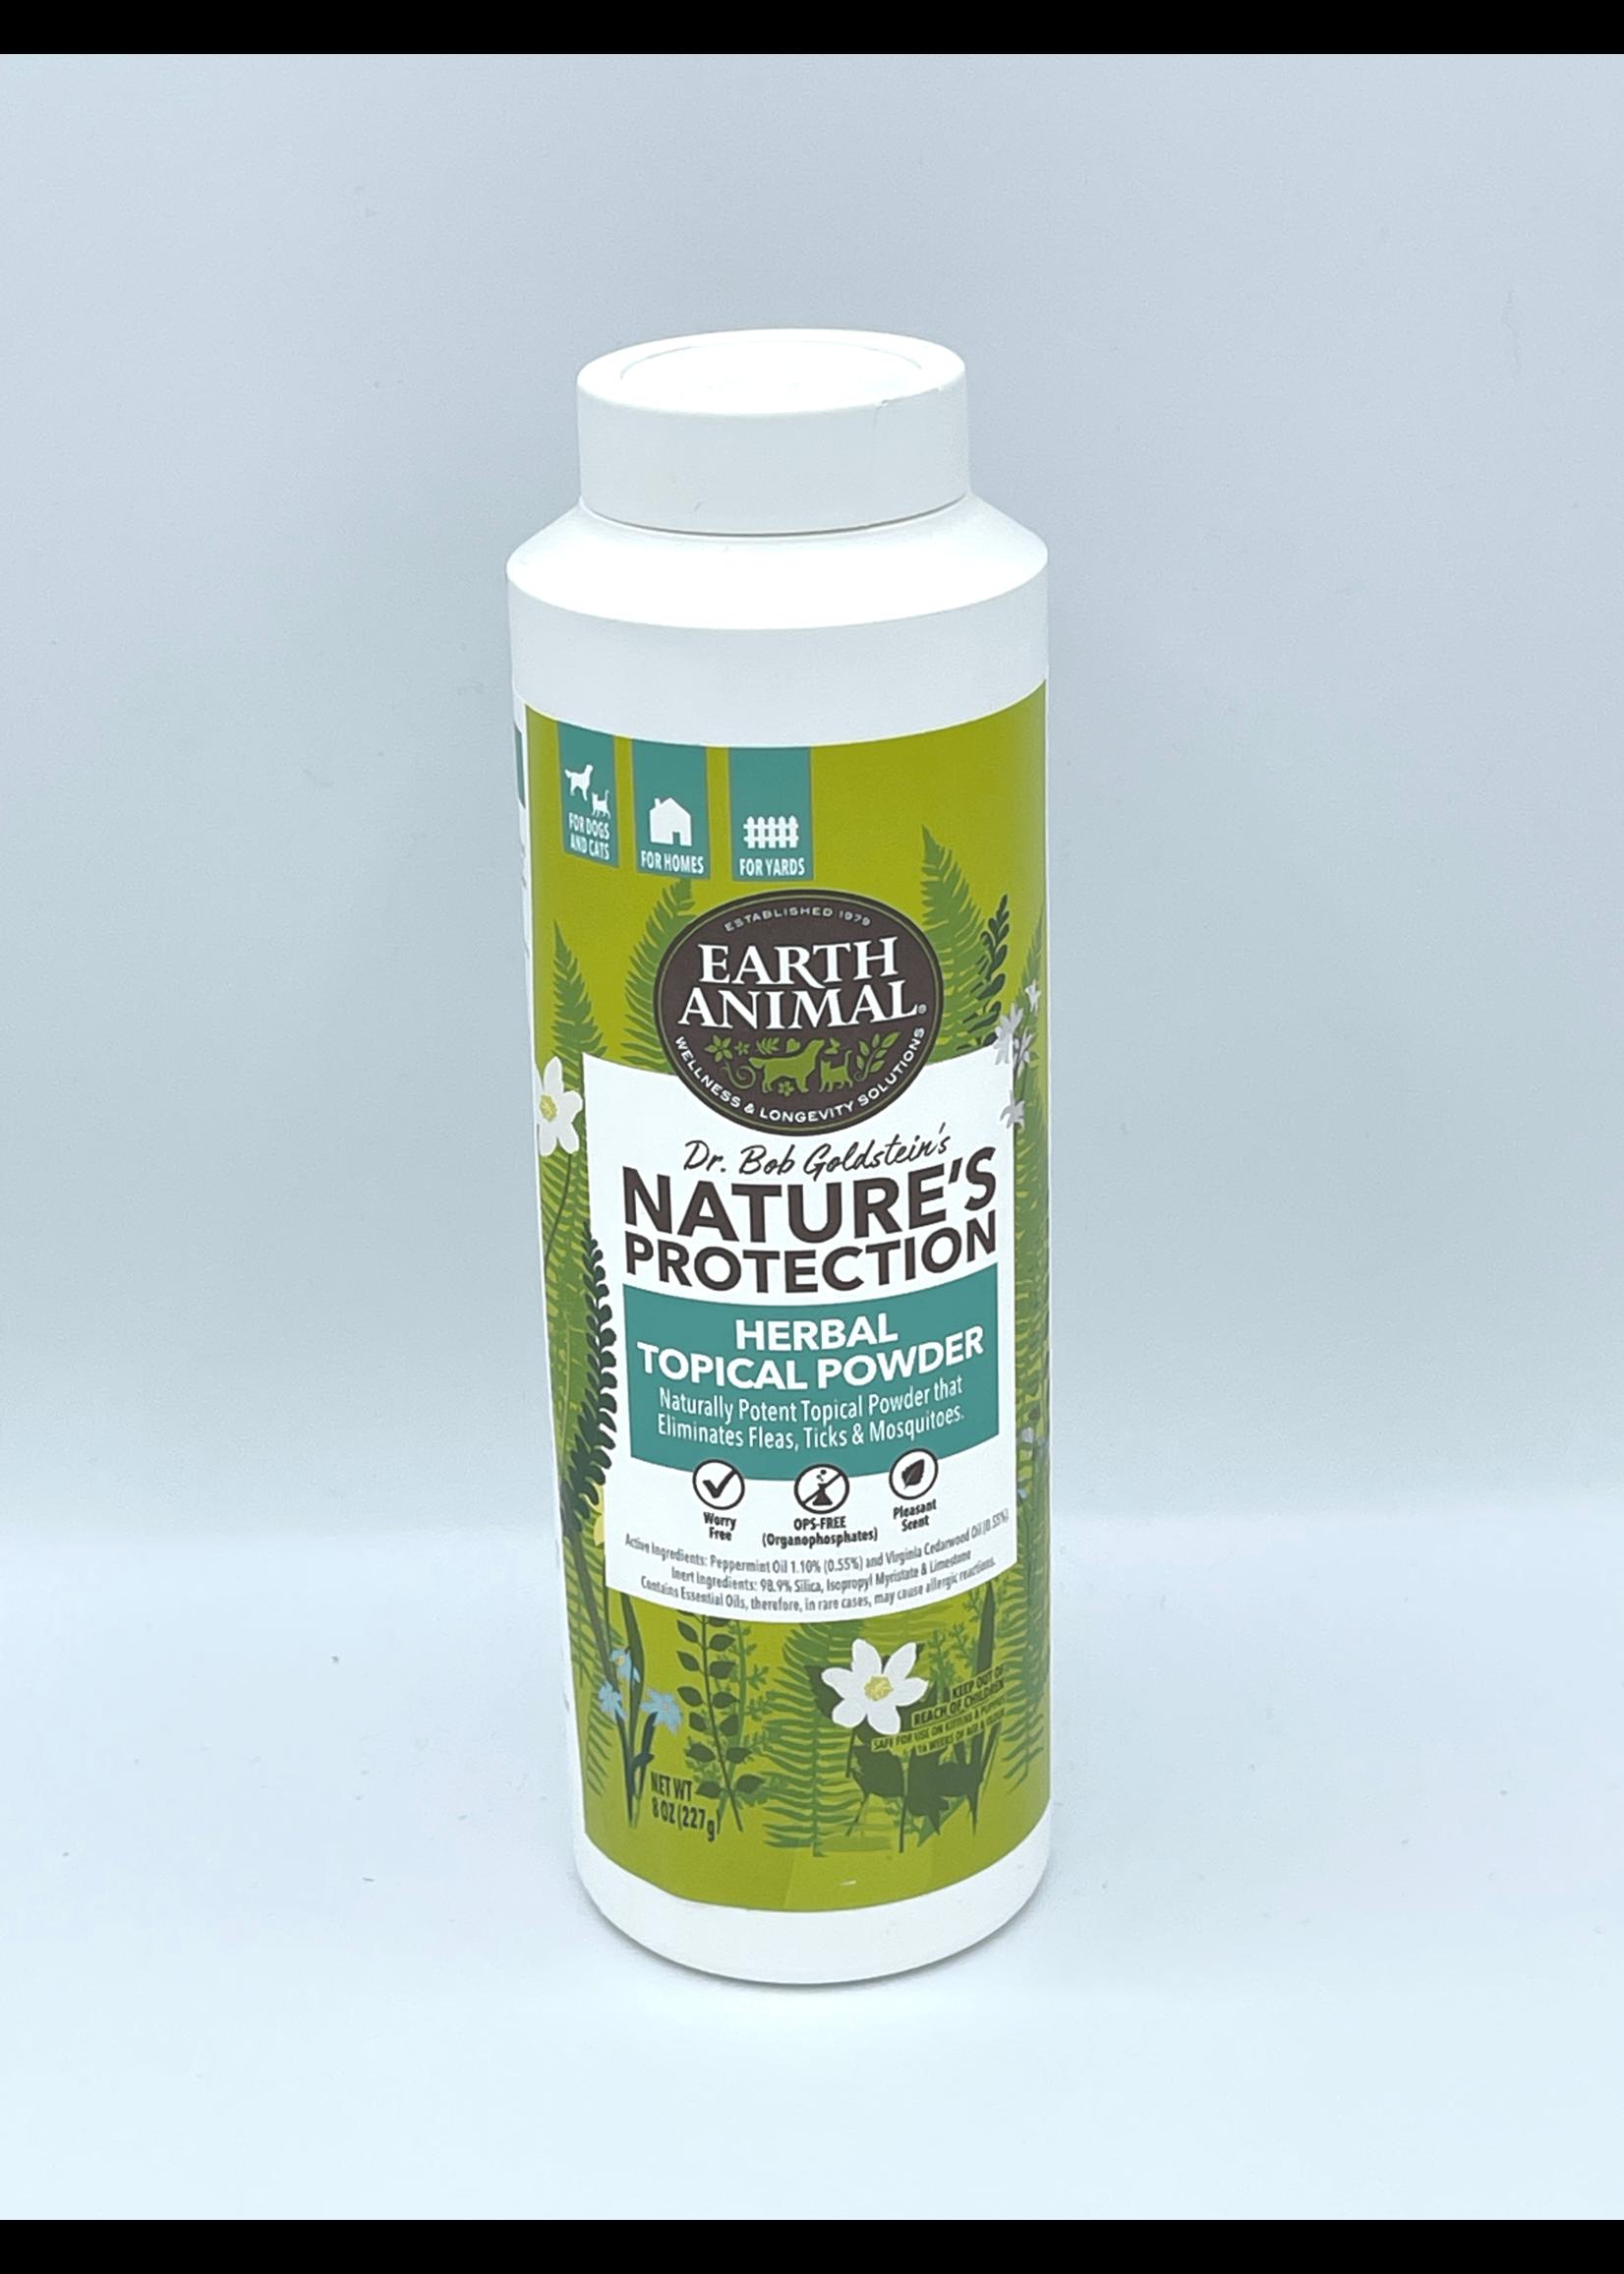 Earth Animal Earth Animal Herbal Topical Powder Flea & Tick